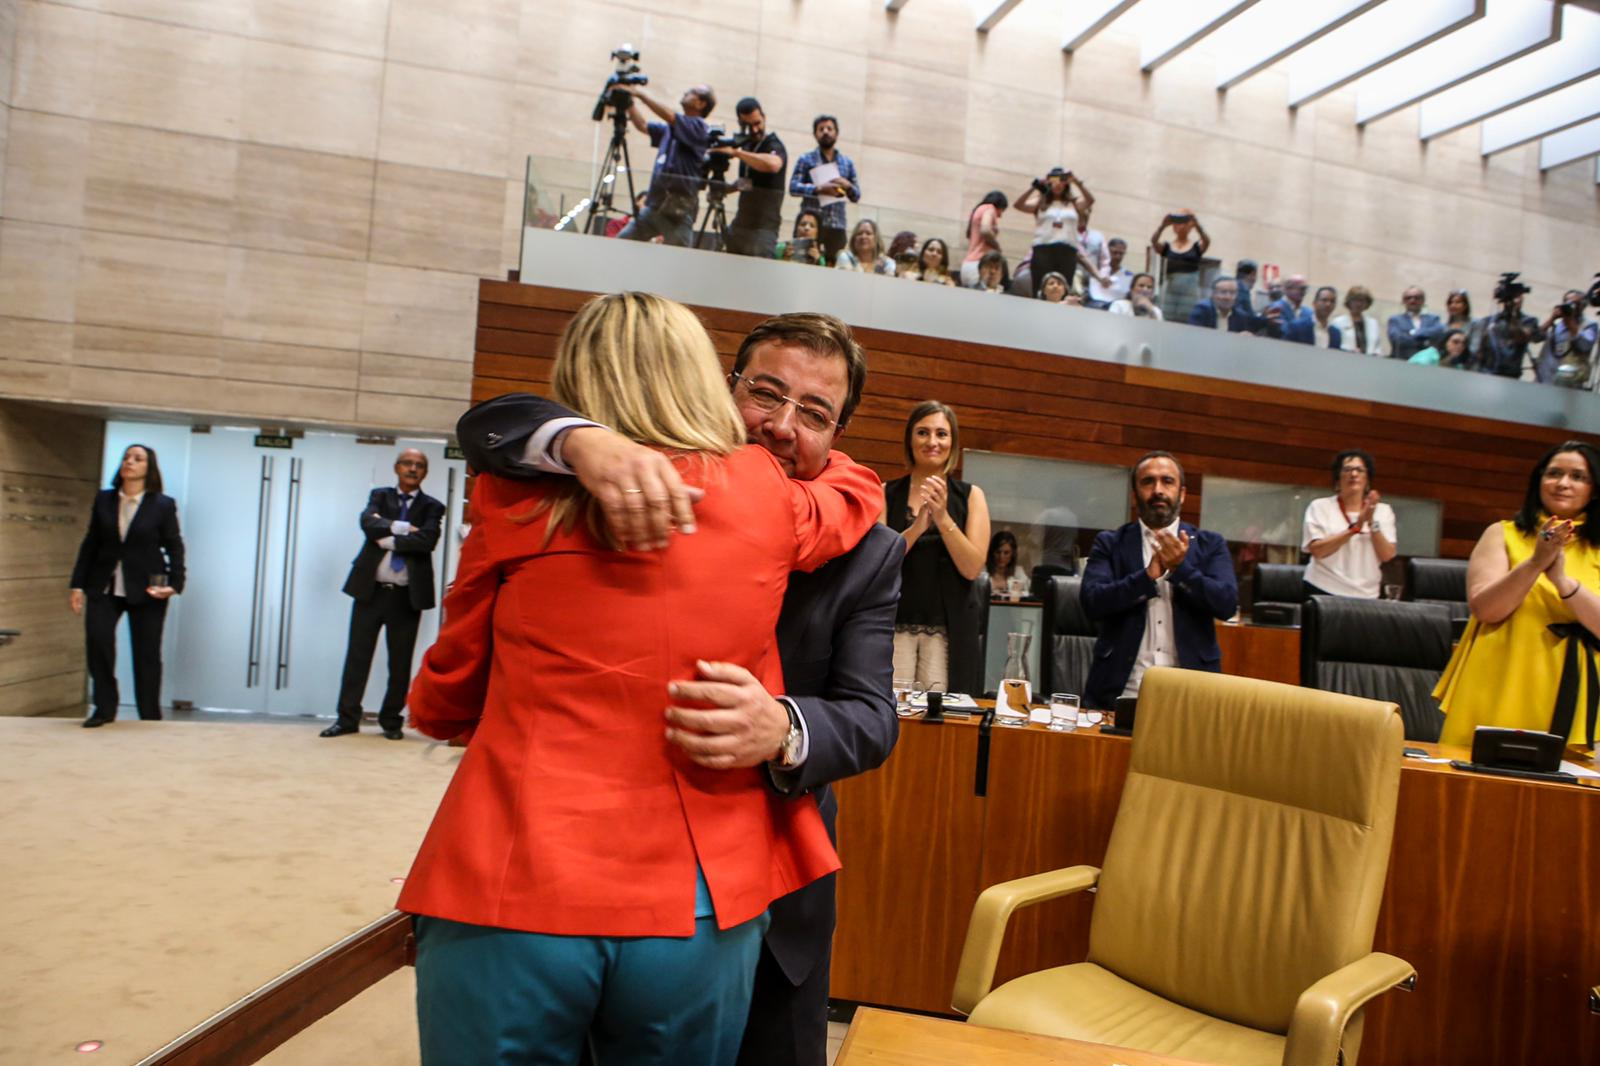 Comienza su andadura la X Legislatura de la Asamblea de Extremadura